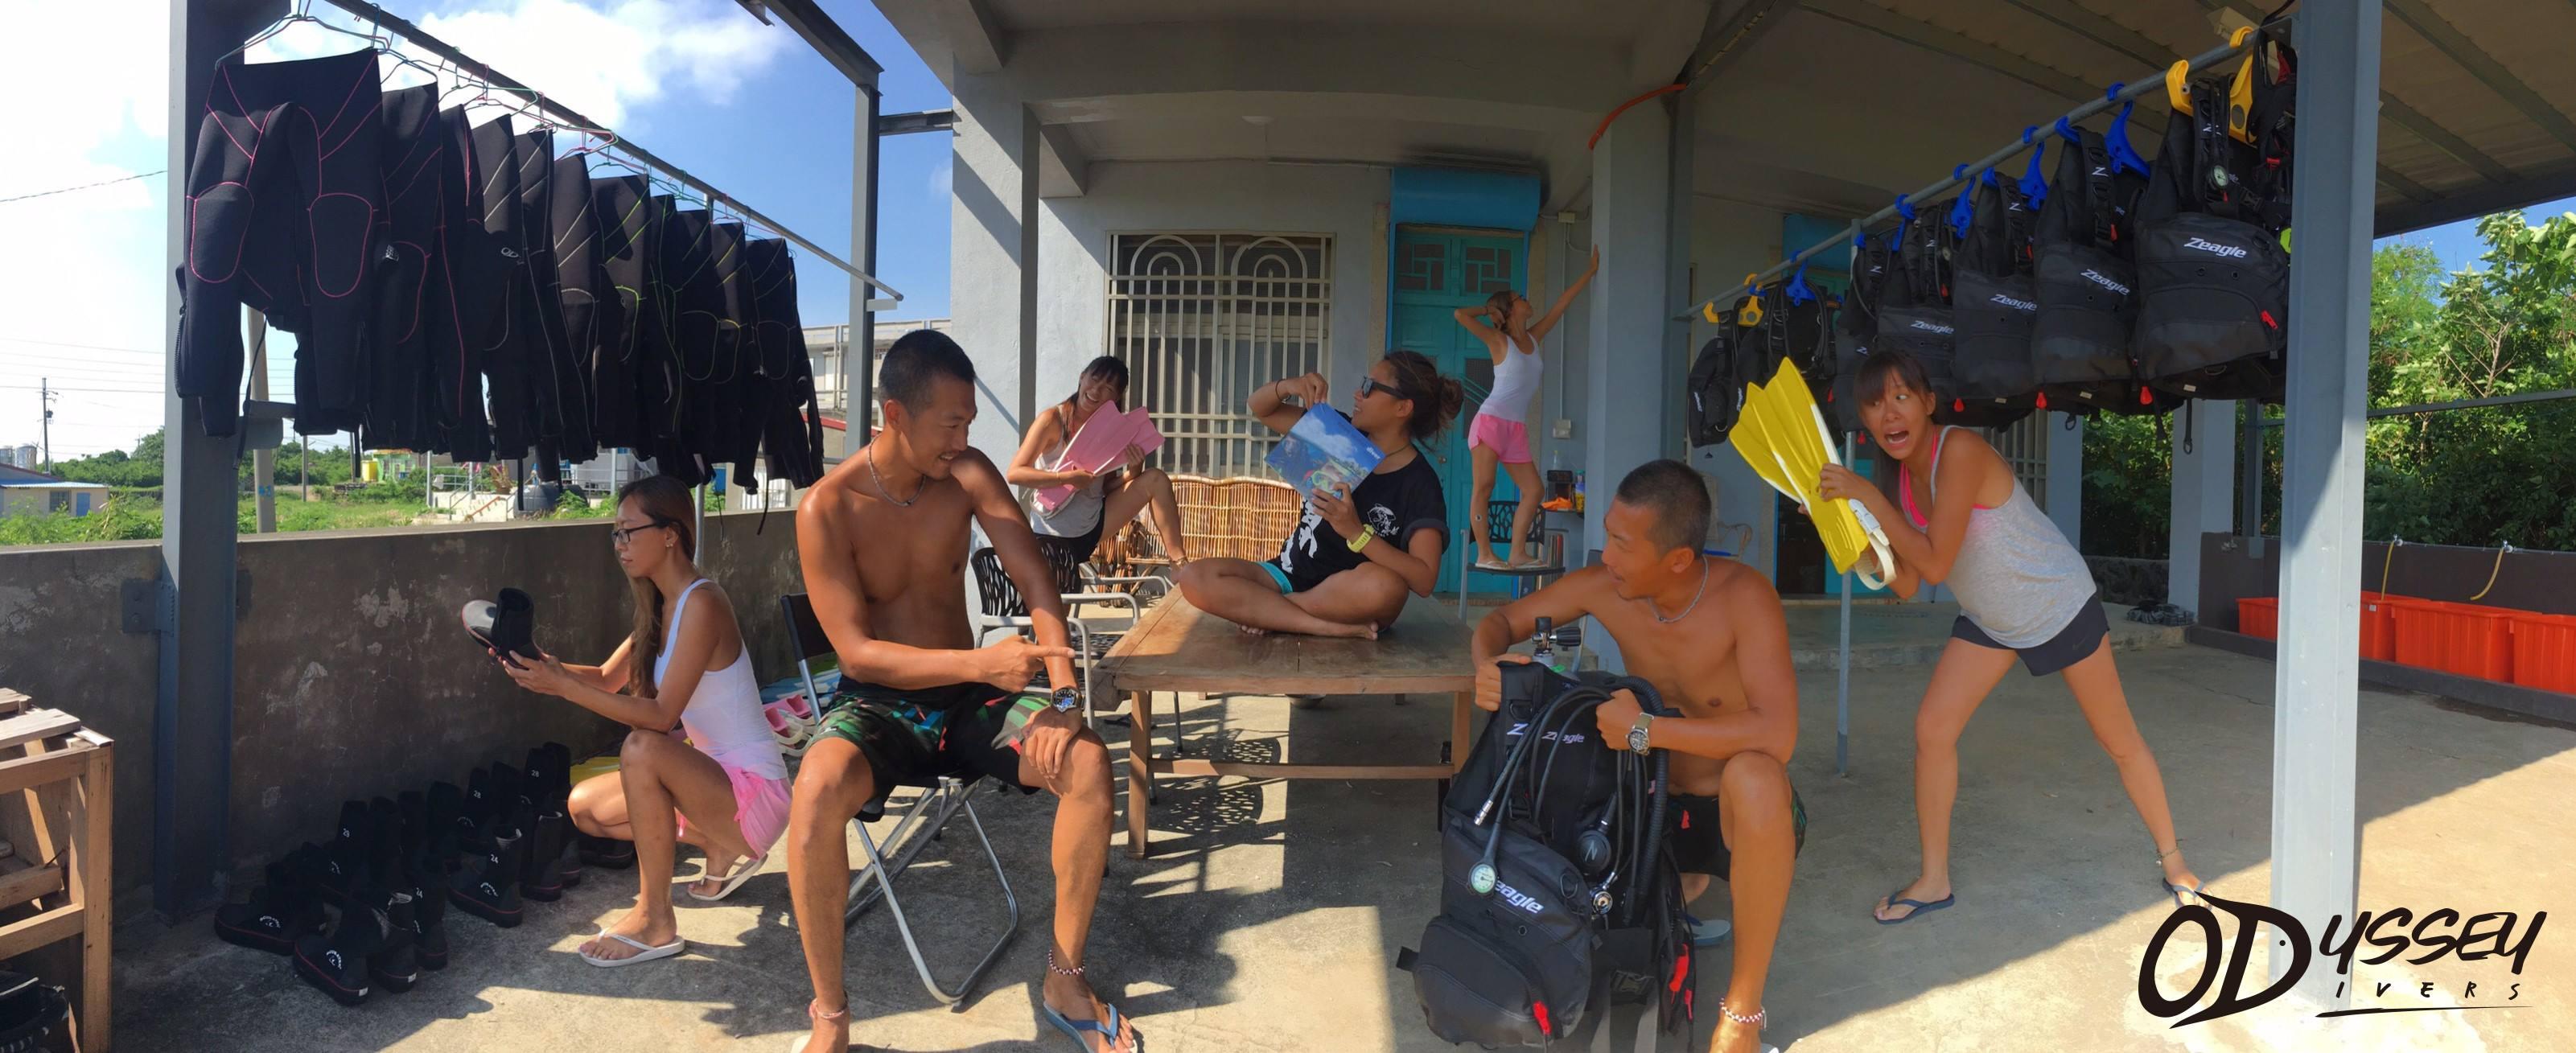 Odyssey Divers Hostel 奧之海潛水旅宿